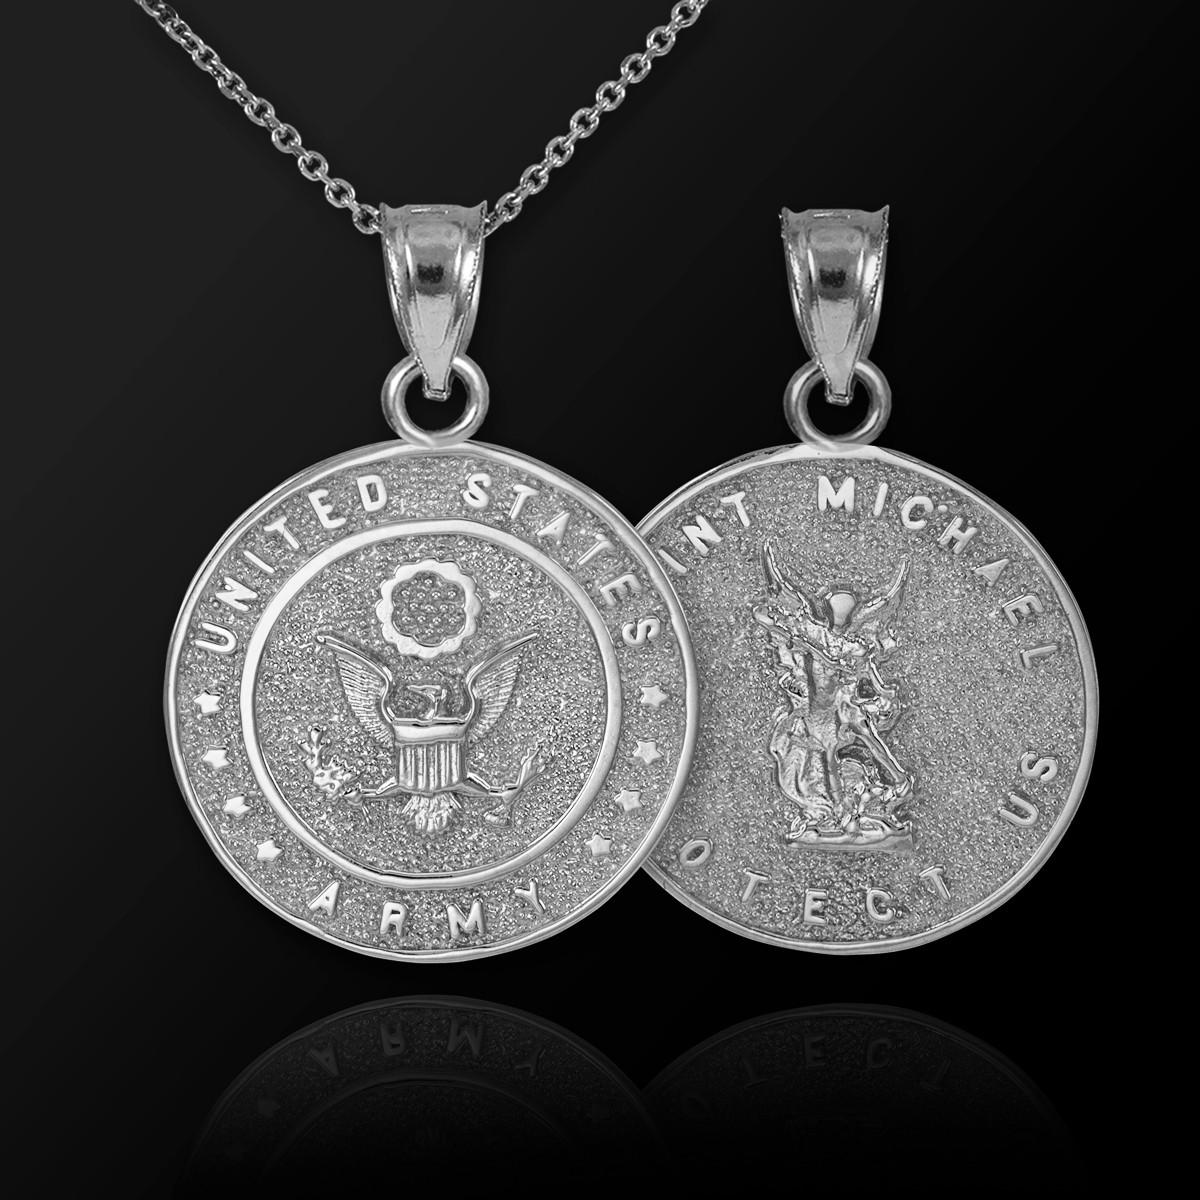 White gold us army reversible st michael pendant necklace aloadofball Choice Image